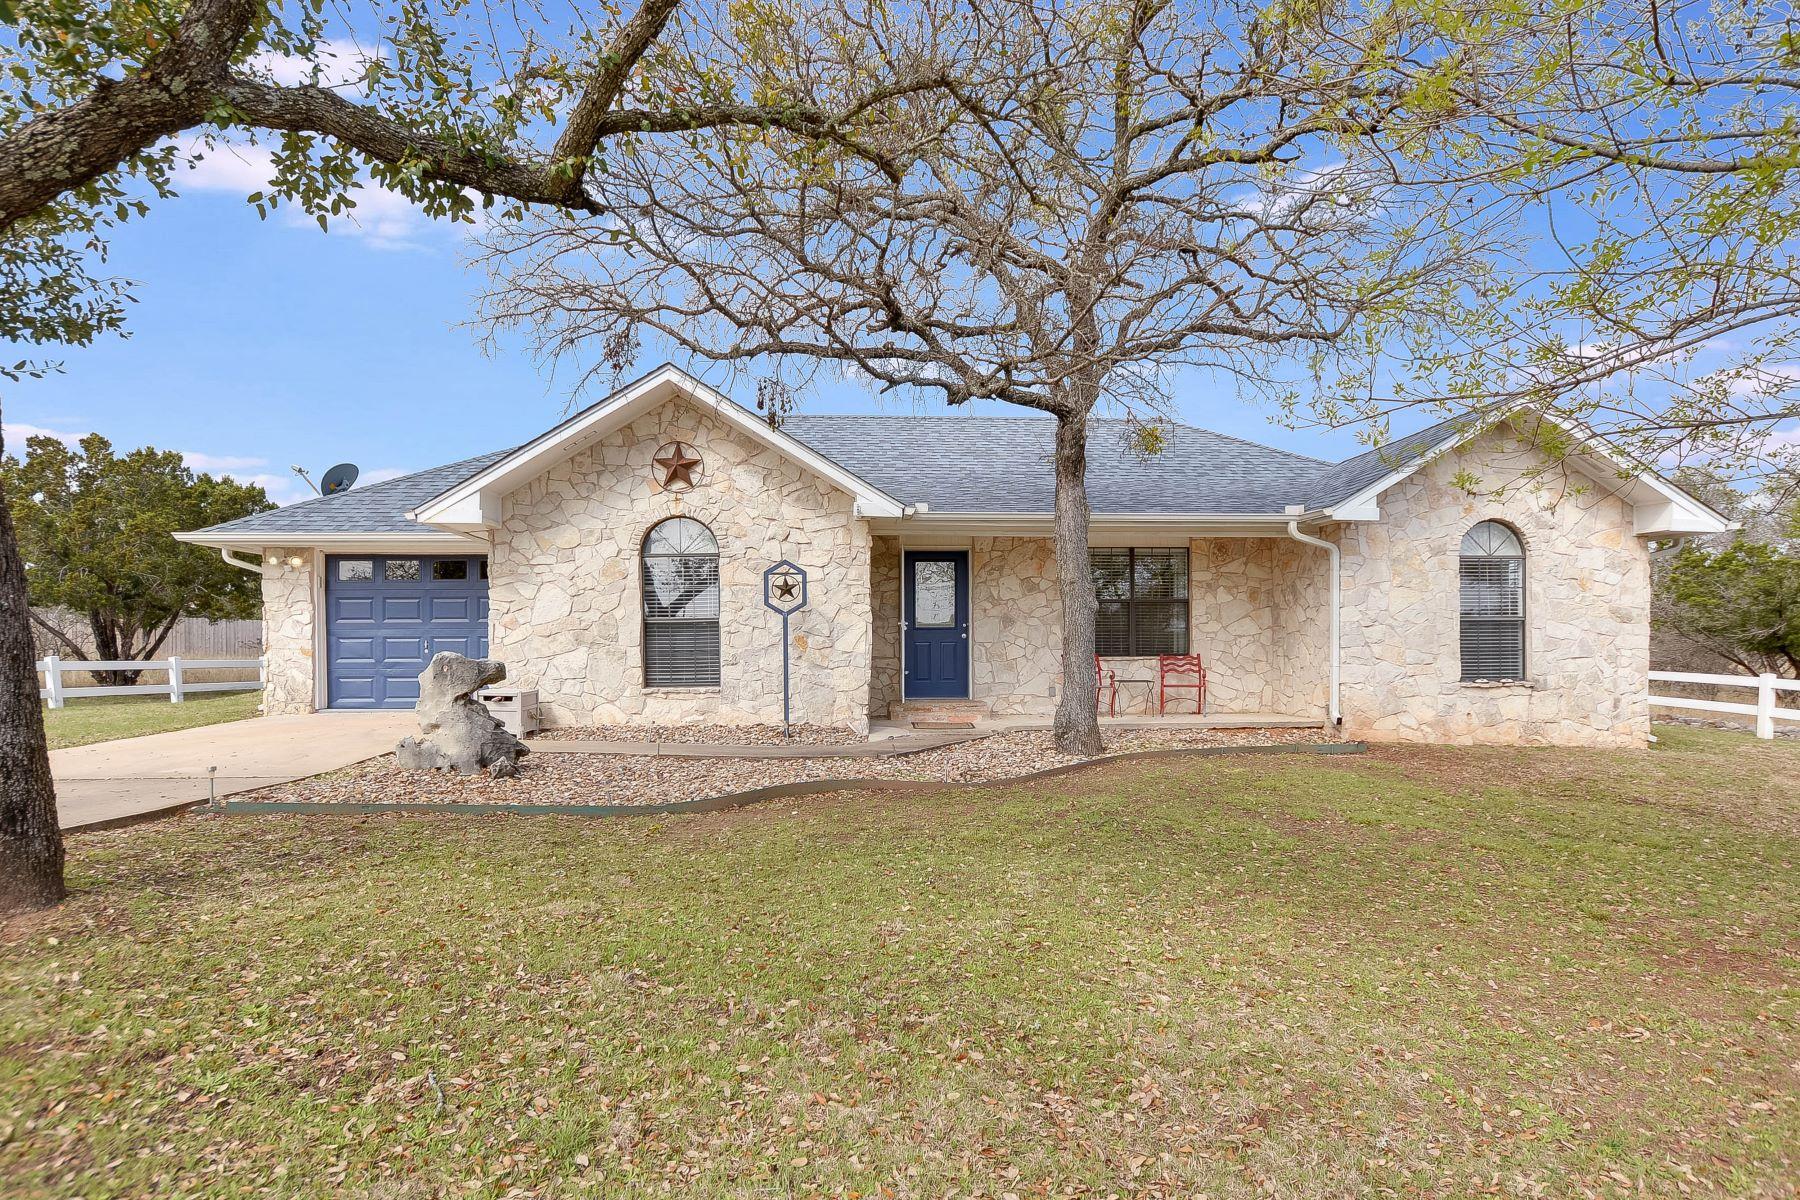 Casa Unifamiliar por un Venta en Updated Tranquility in Horseshoe Bay 1508 Whitetail Road Horseshoe Bay, Texas 78657 Estados Unidos